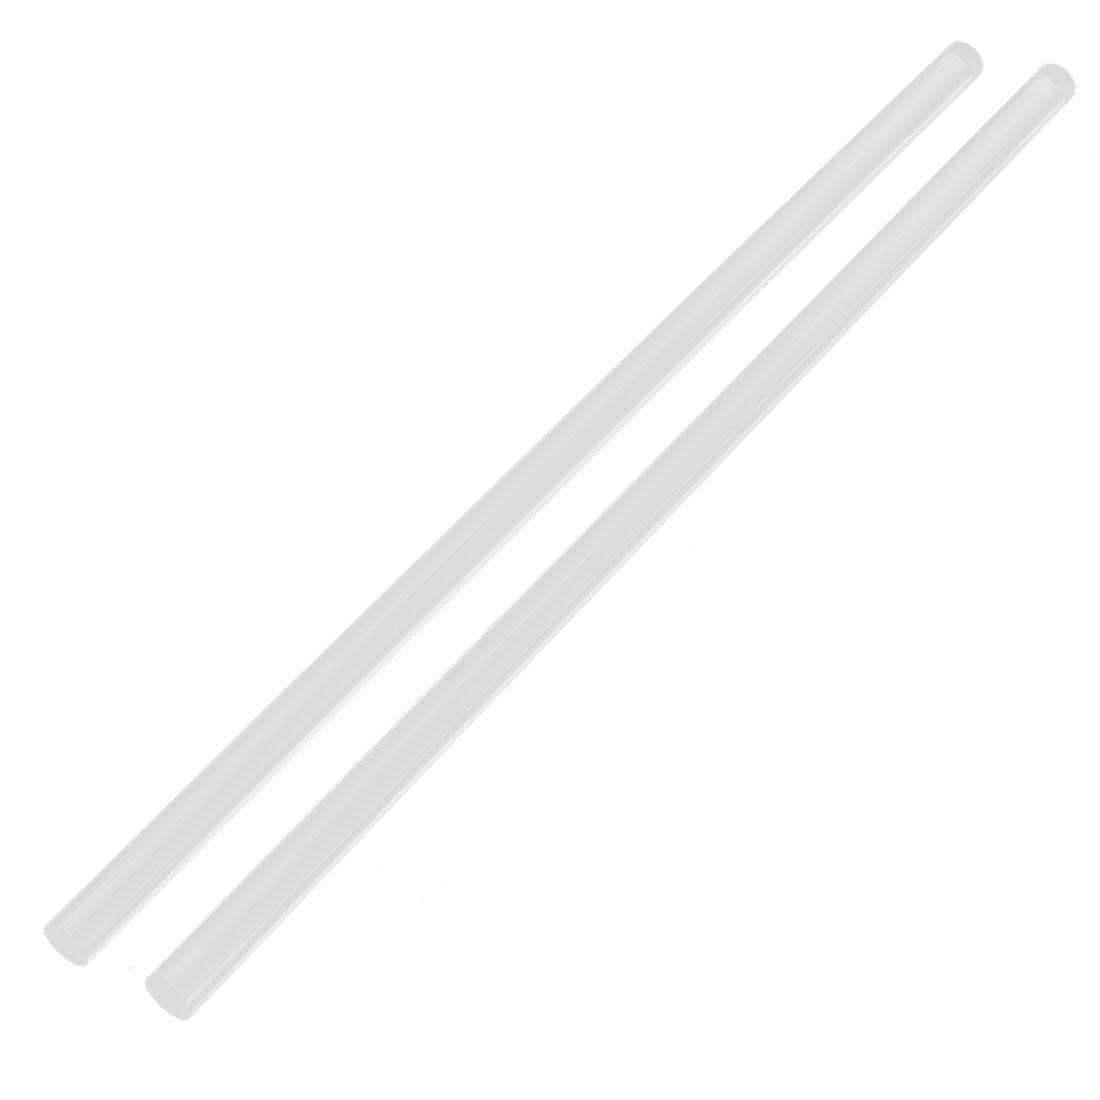 "2Pcs 11mm Dia Clear Round Acrylic Bar PMMA Extruded Rod 12"" Length"